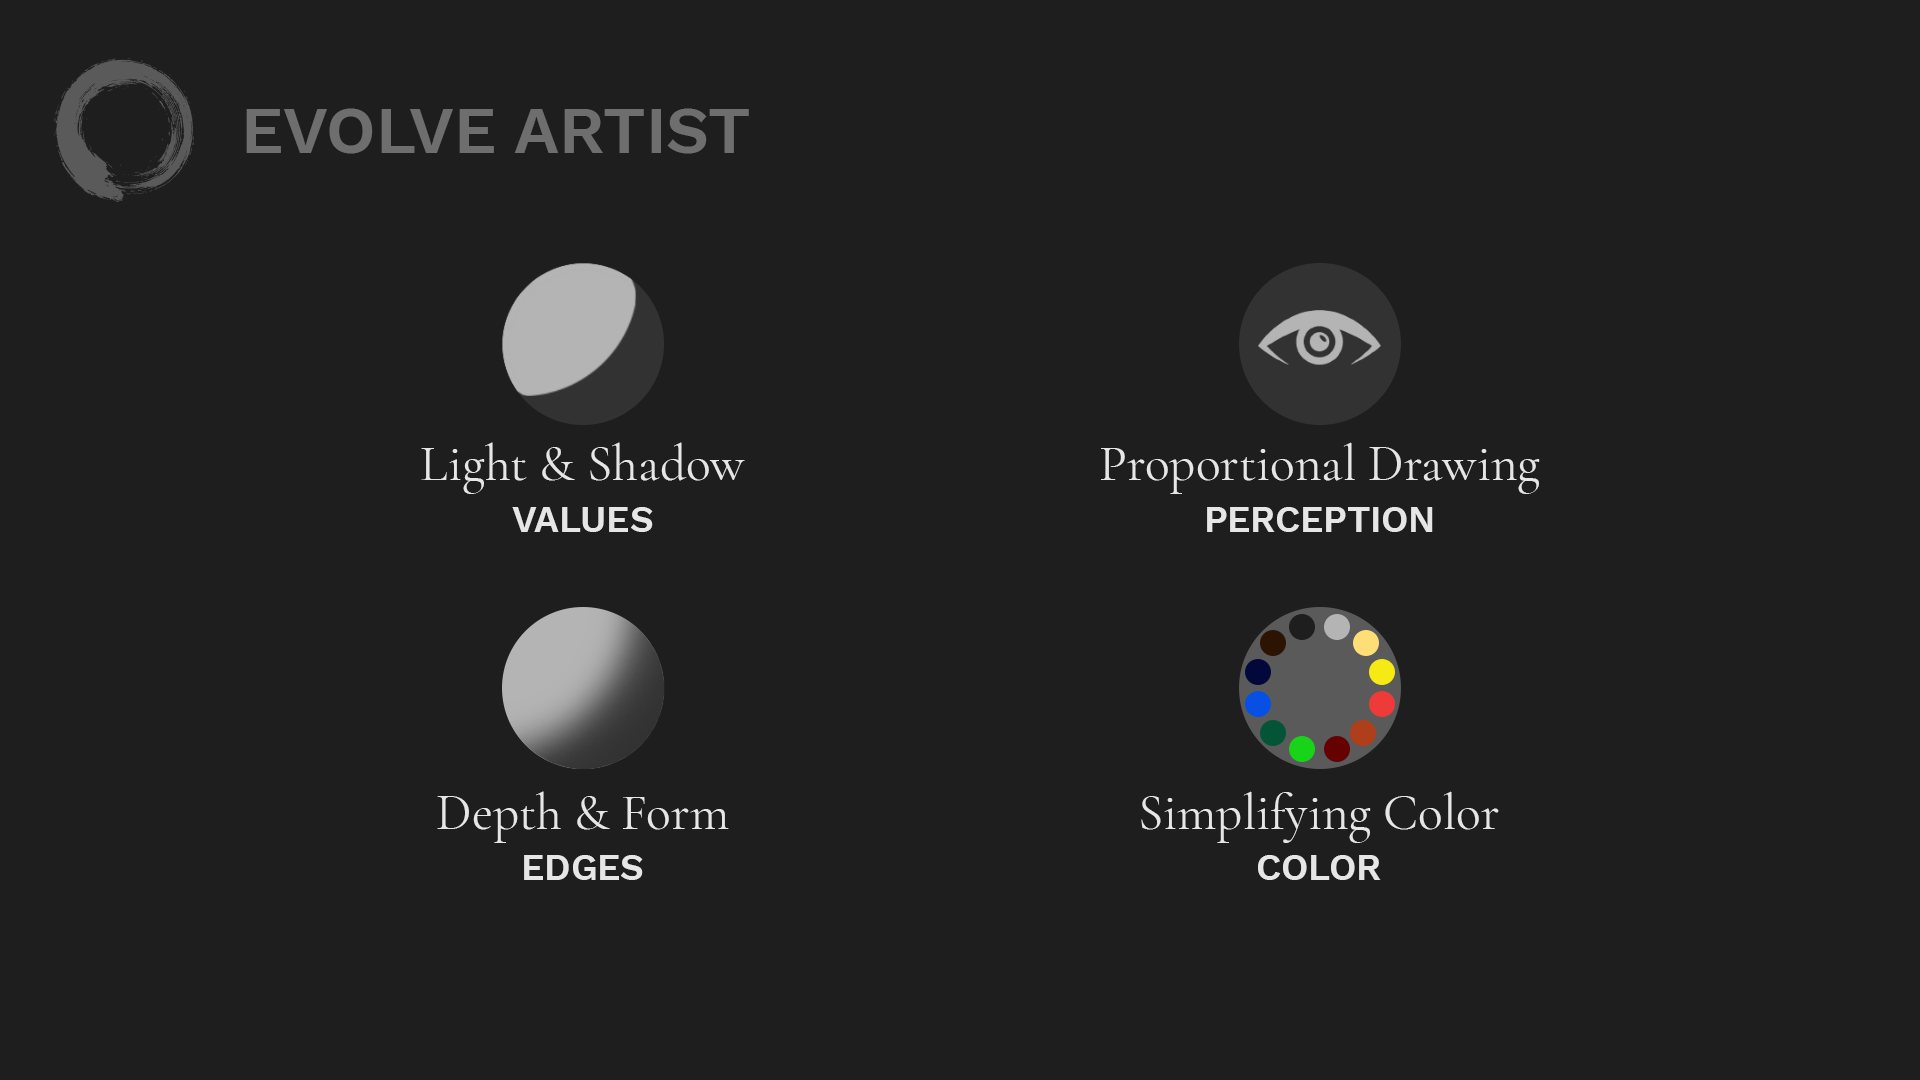 Evolve's Four Fundamentals of Art: Values, Edges, Perception, Color